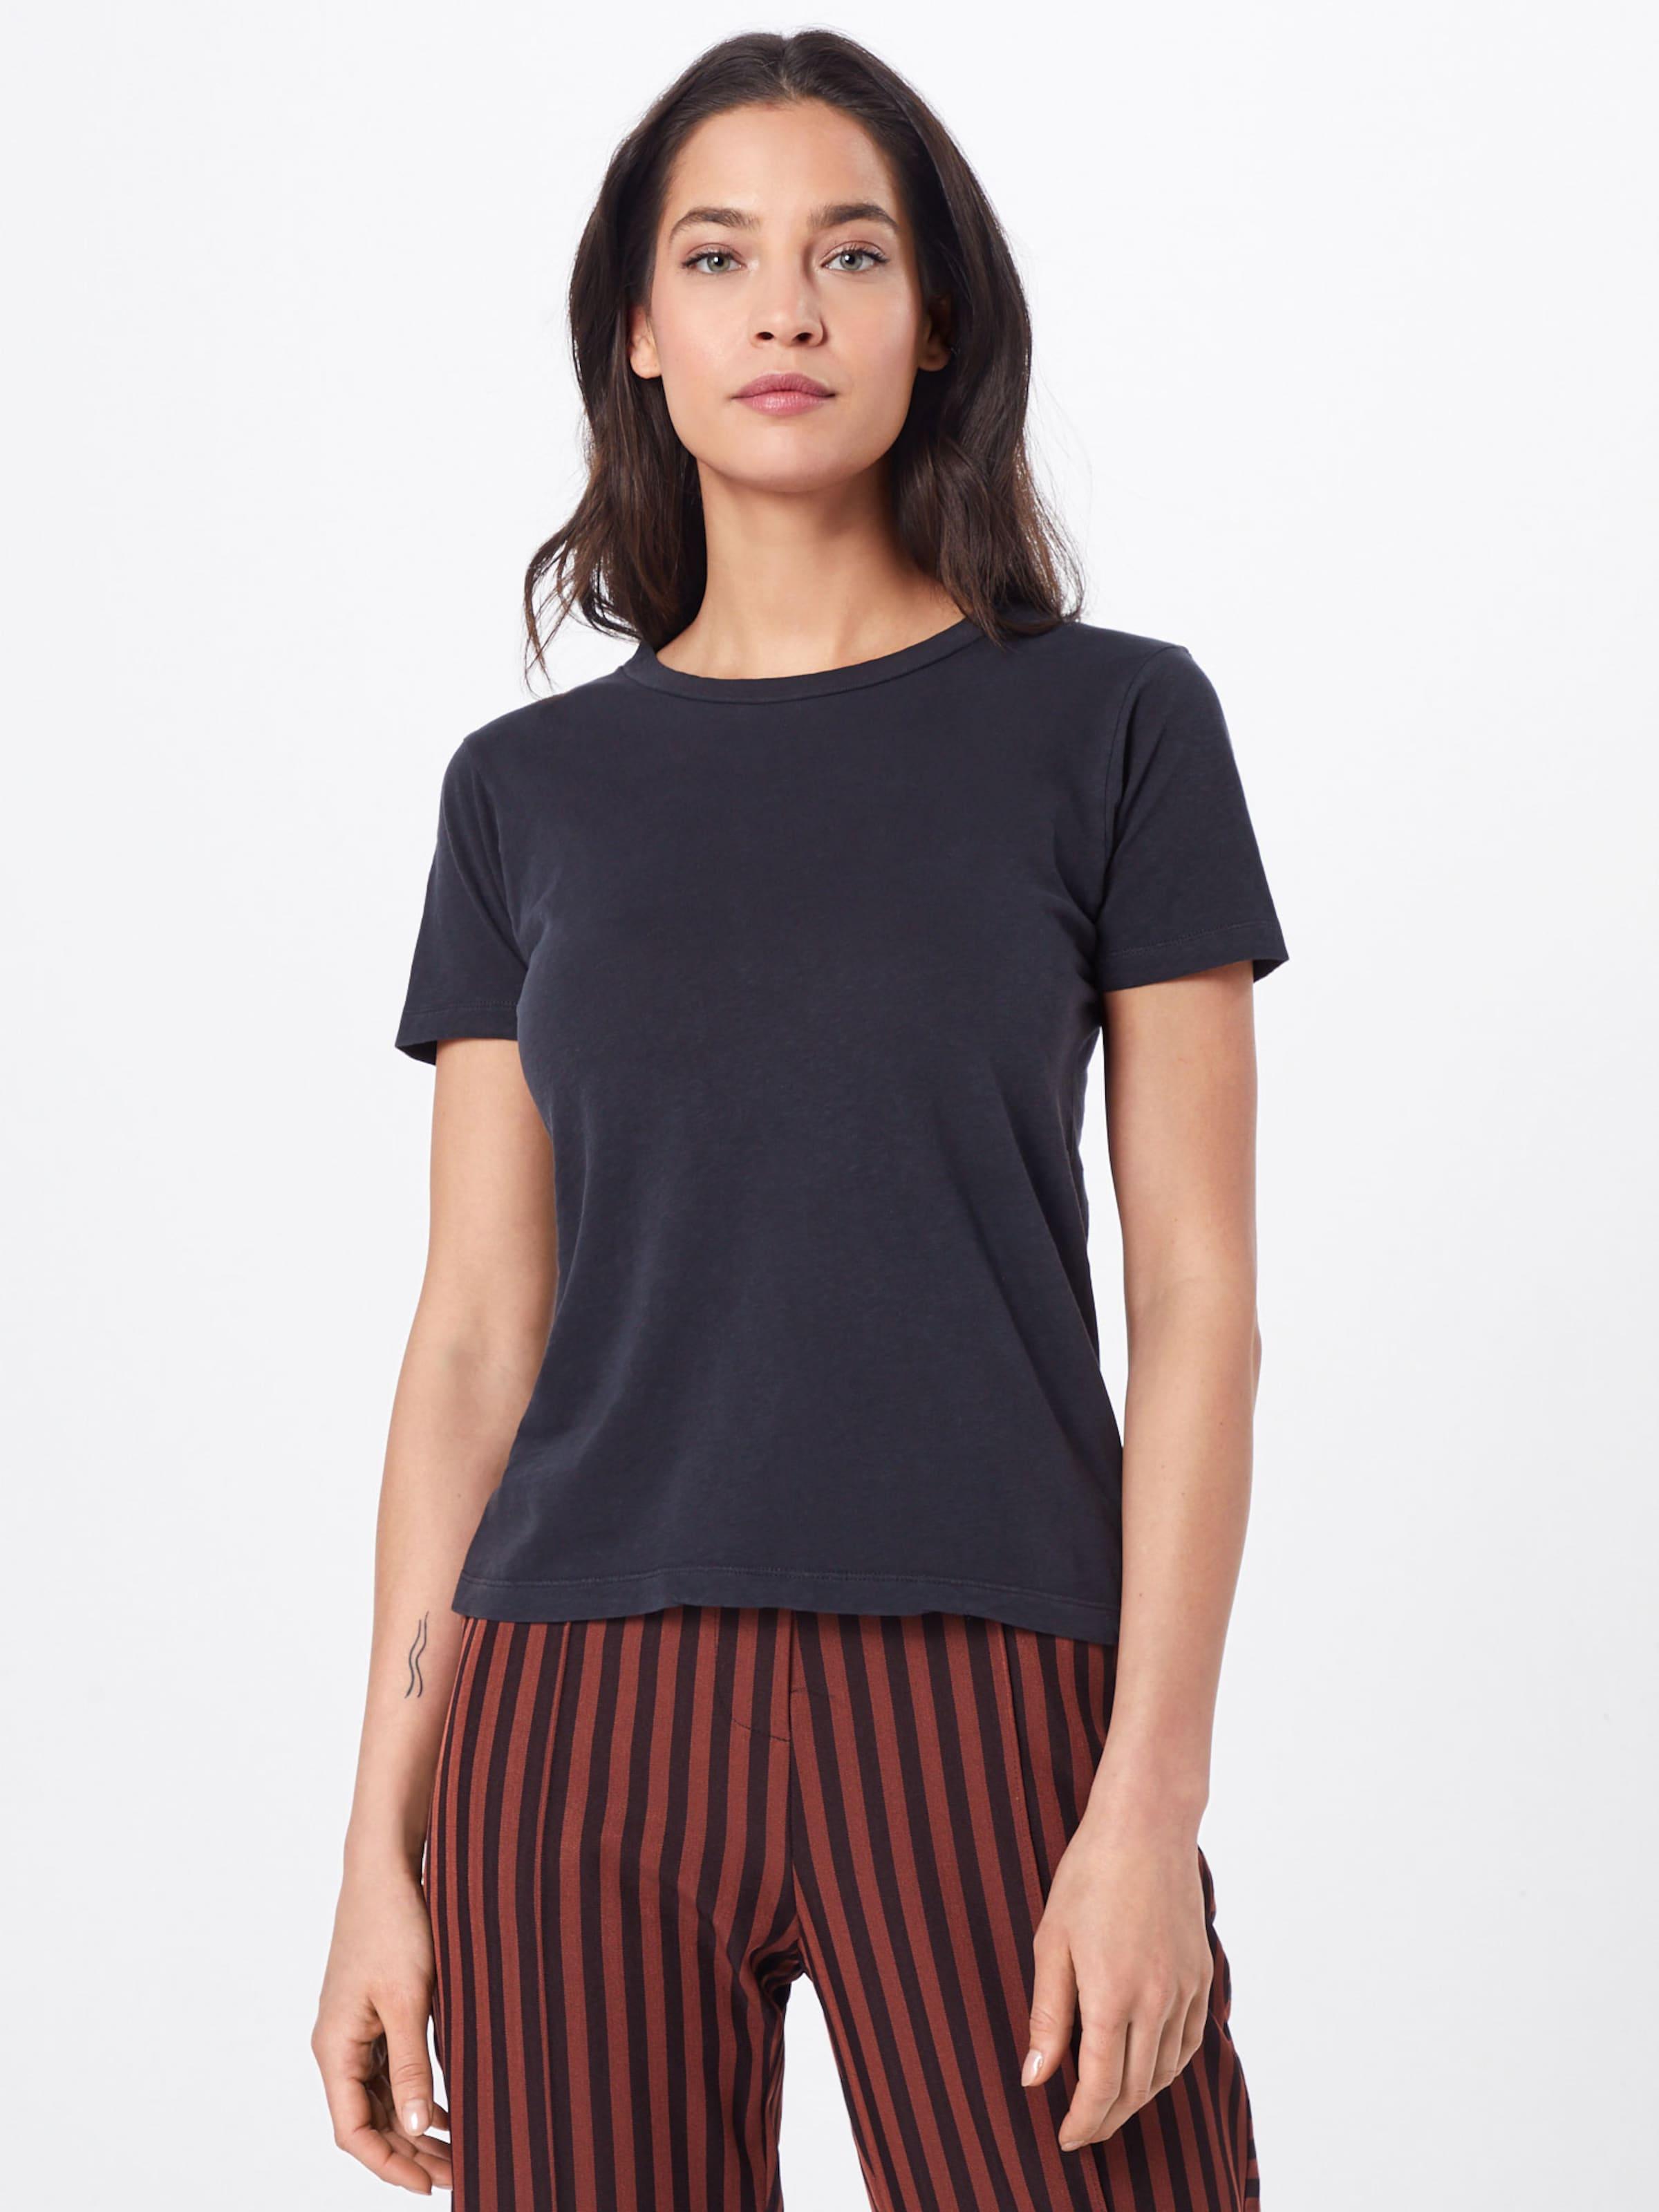 Vintage T shirt Noir American 'gamipy' En f6g7yvbY